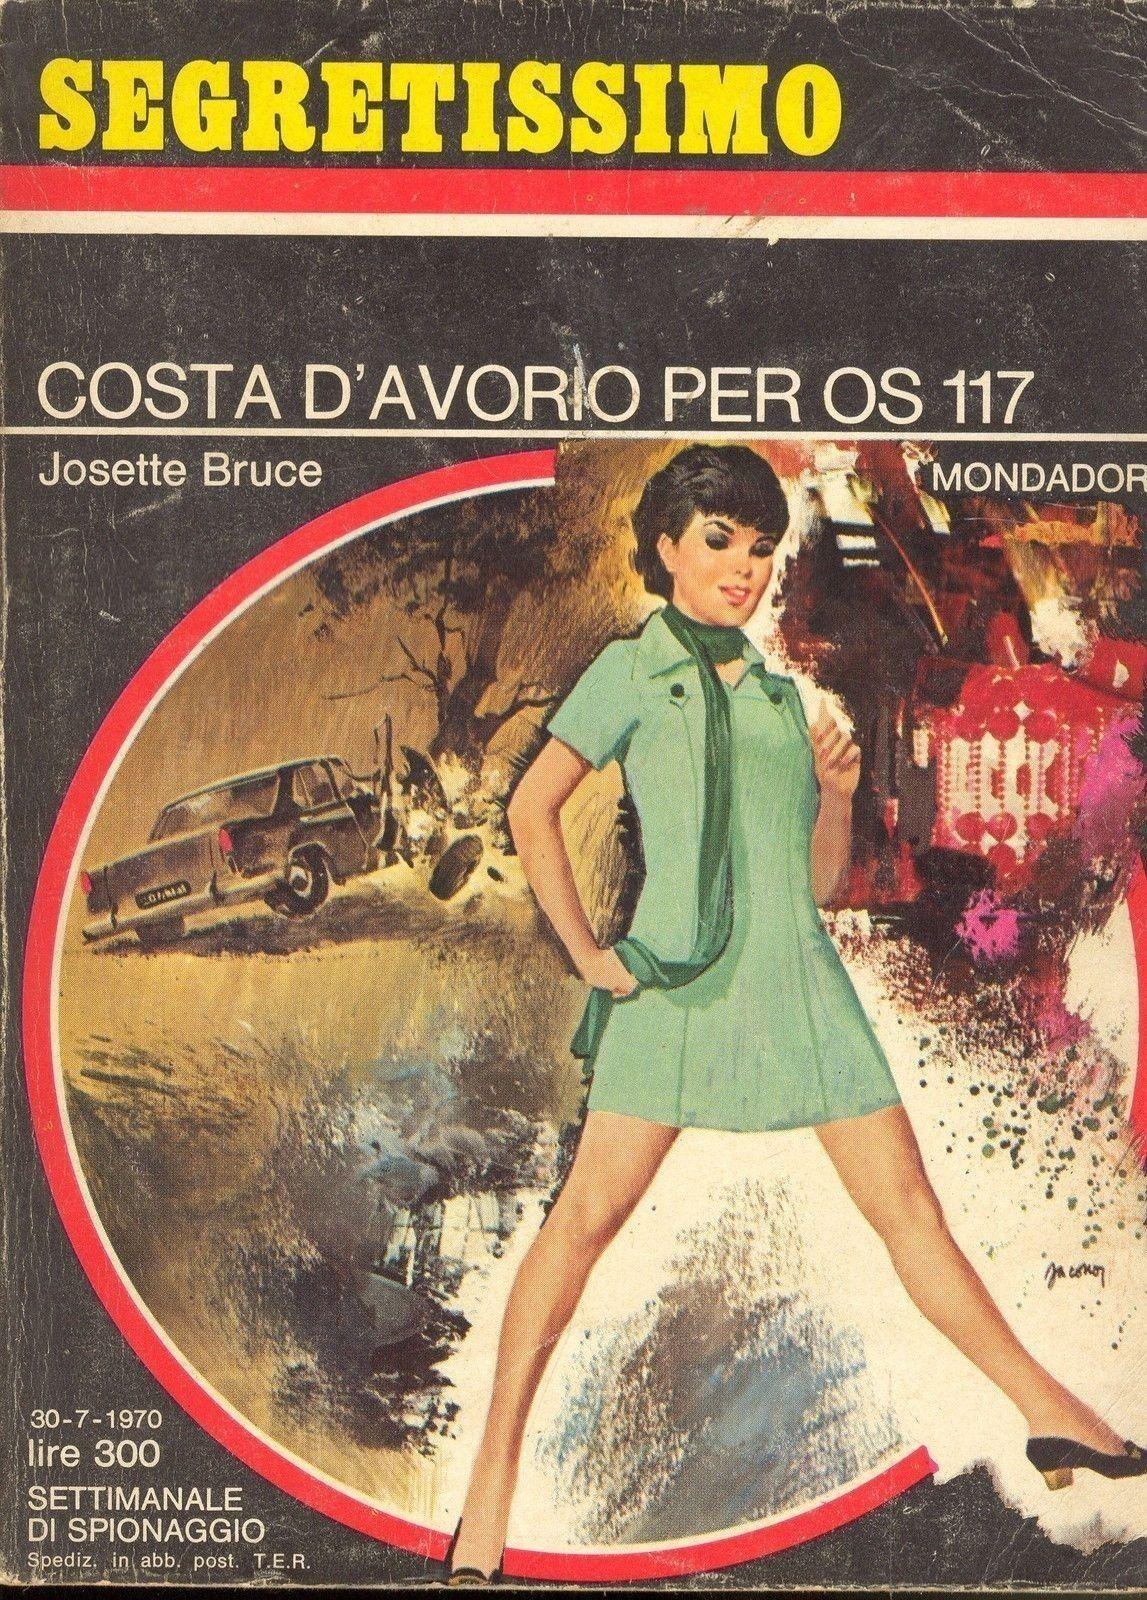 COSTA D'AVORIO PER  OS 117 - JOSETTE BRUCE